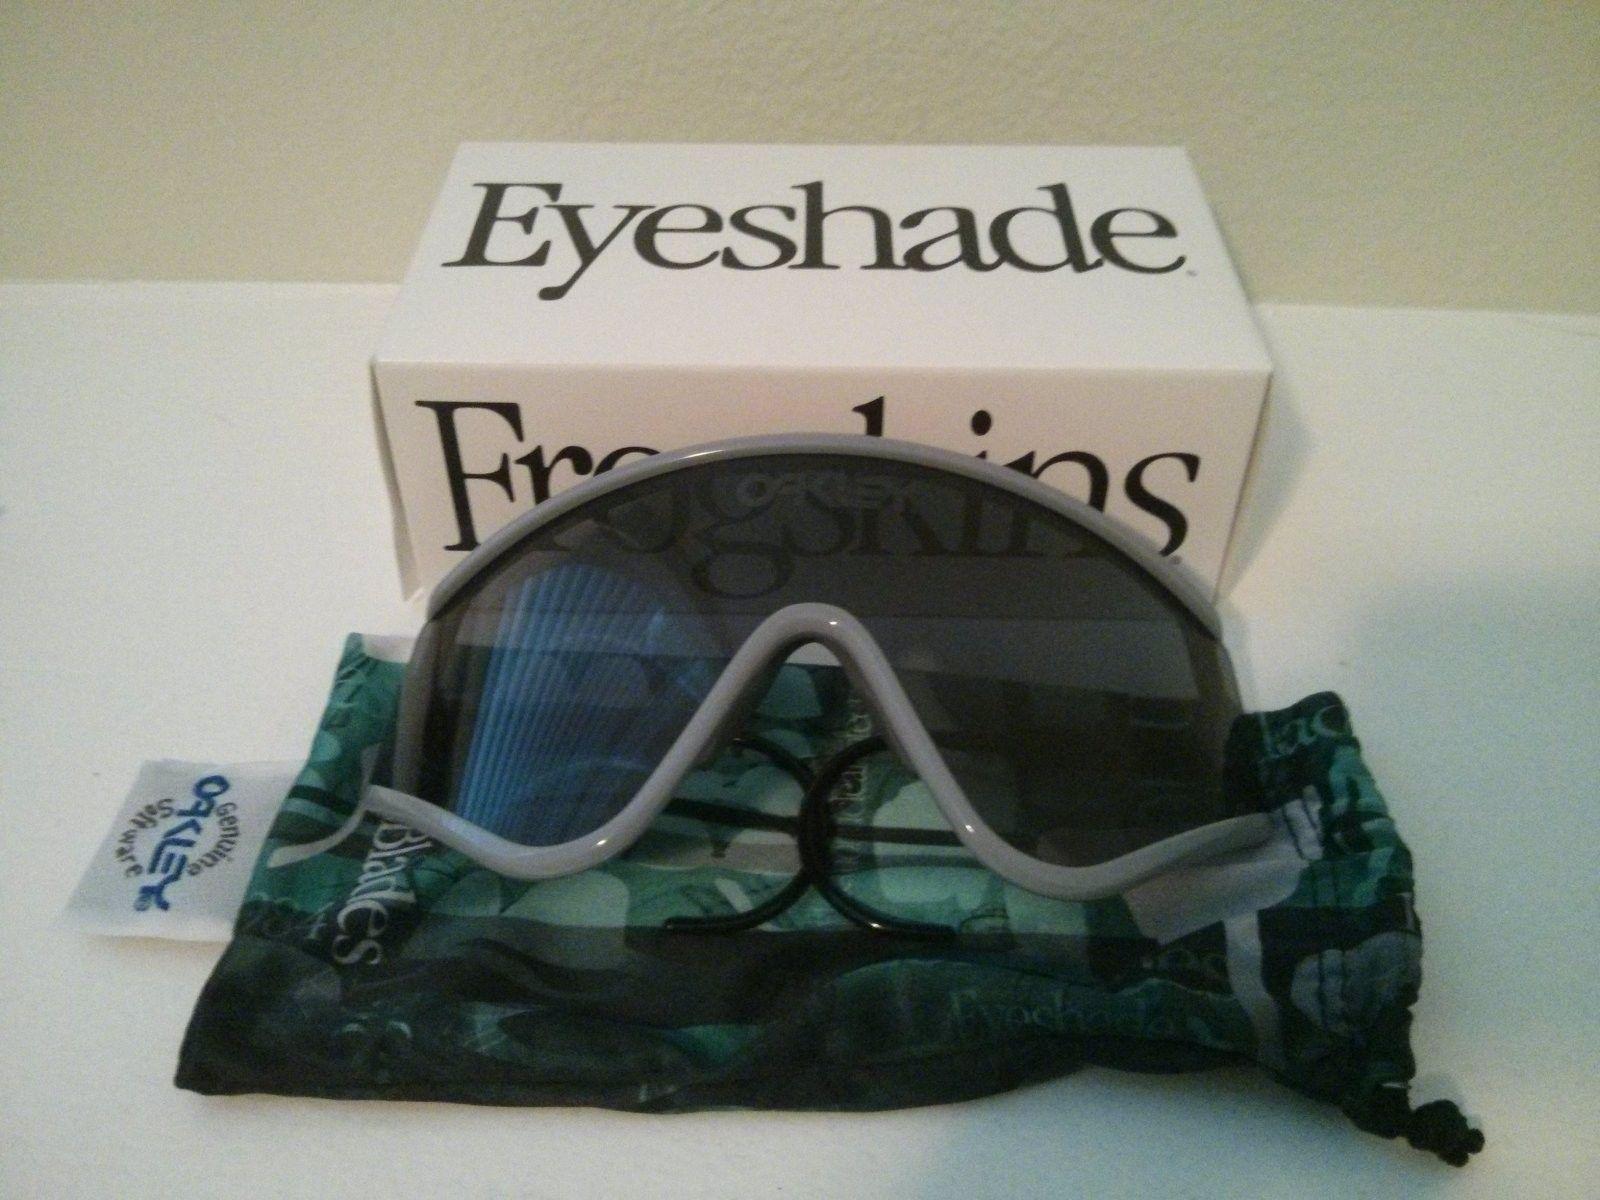 Fog Eyeshades - IMG_20140814_191636.jpg